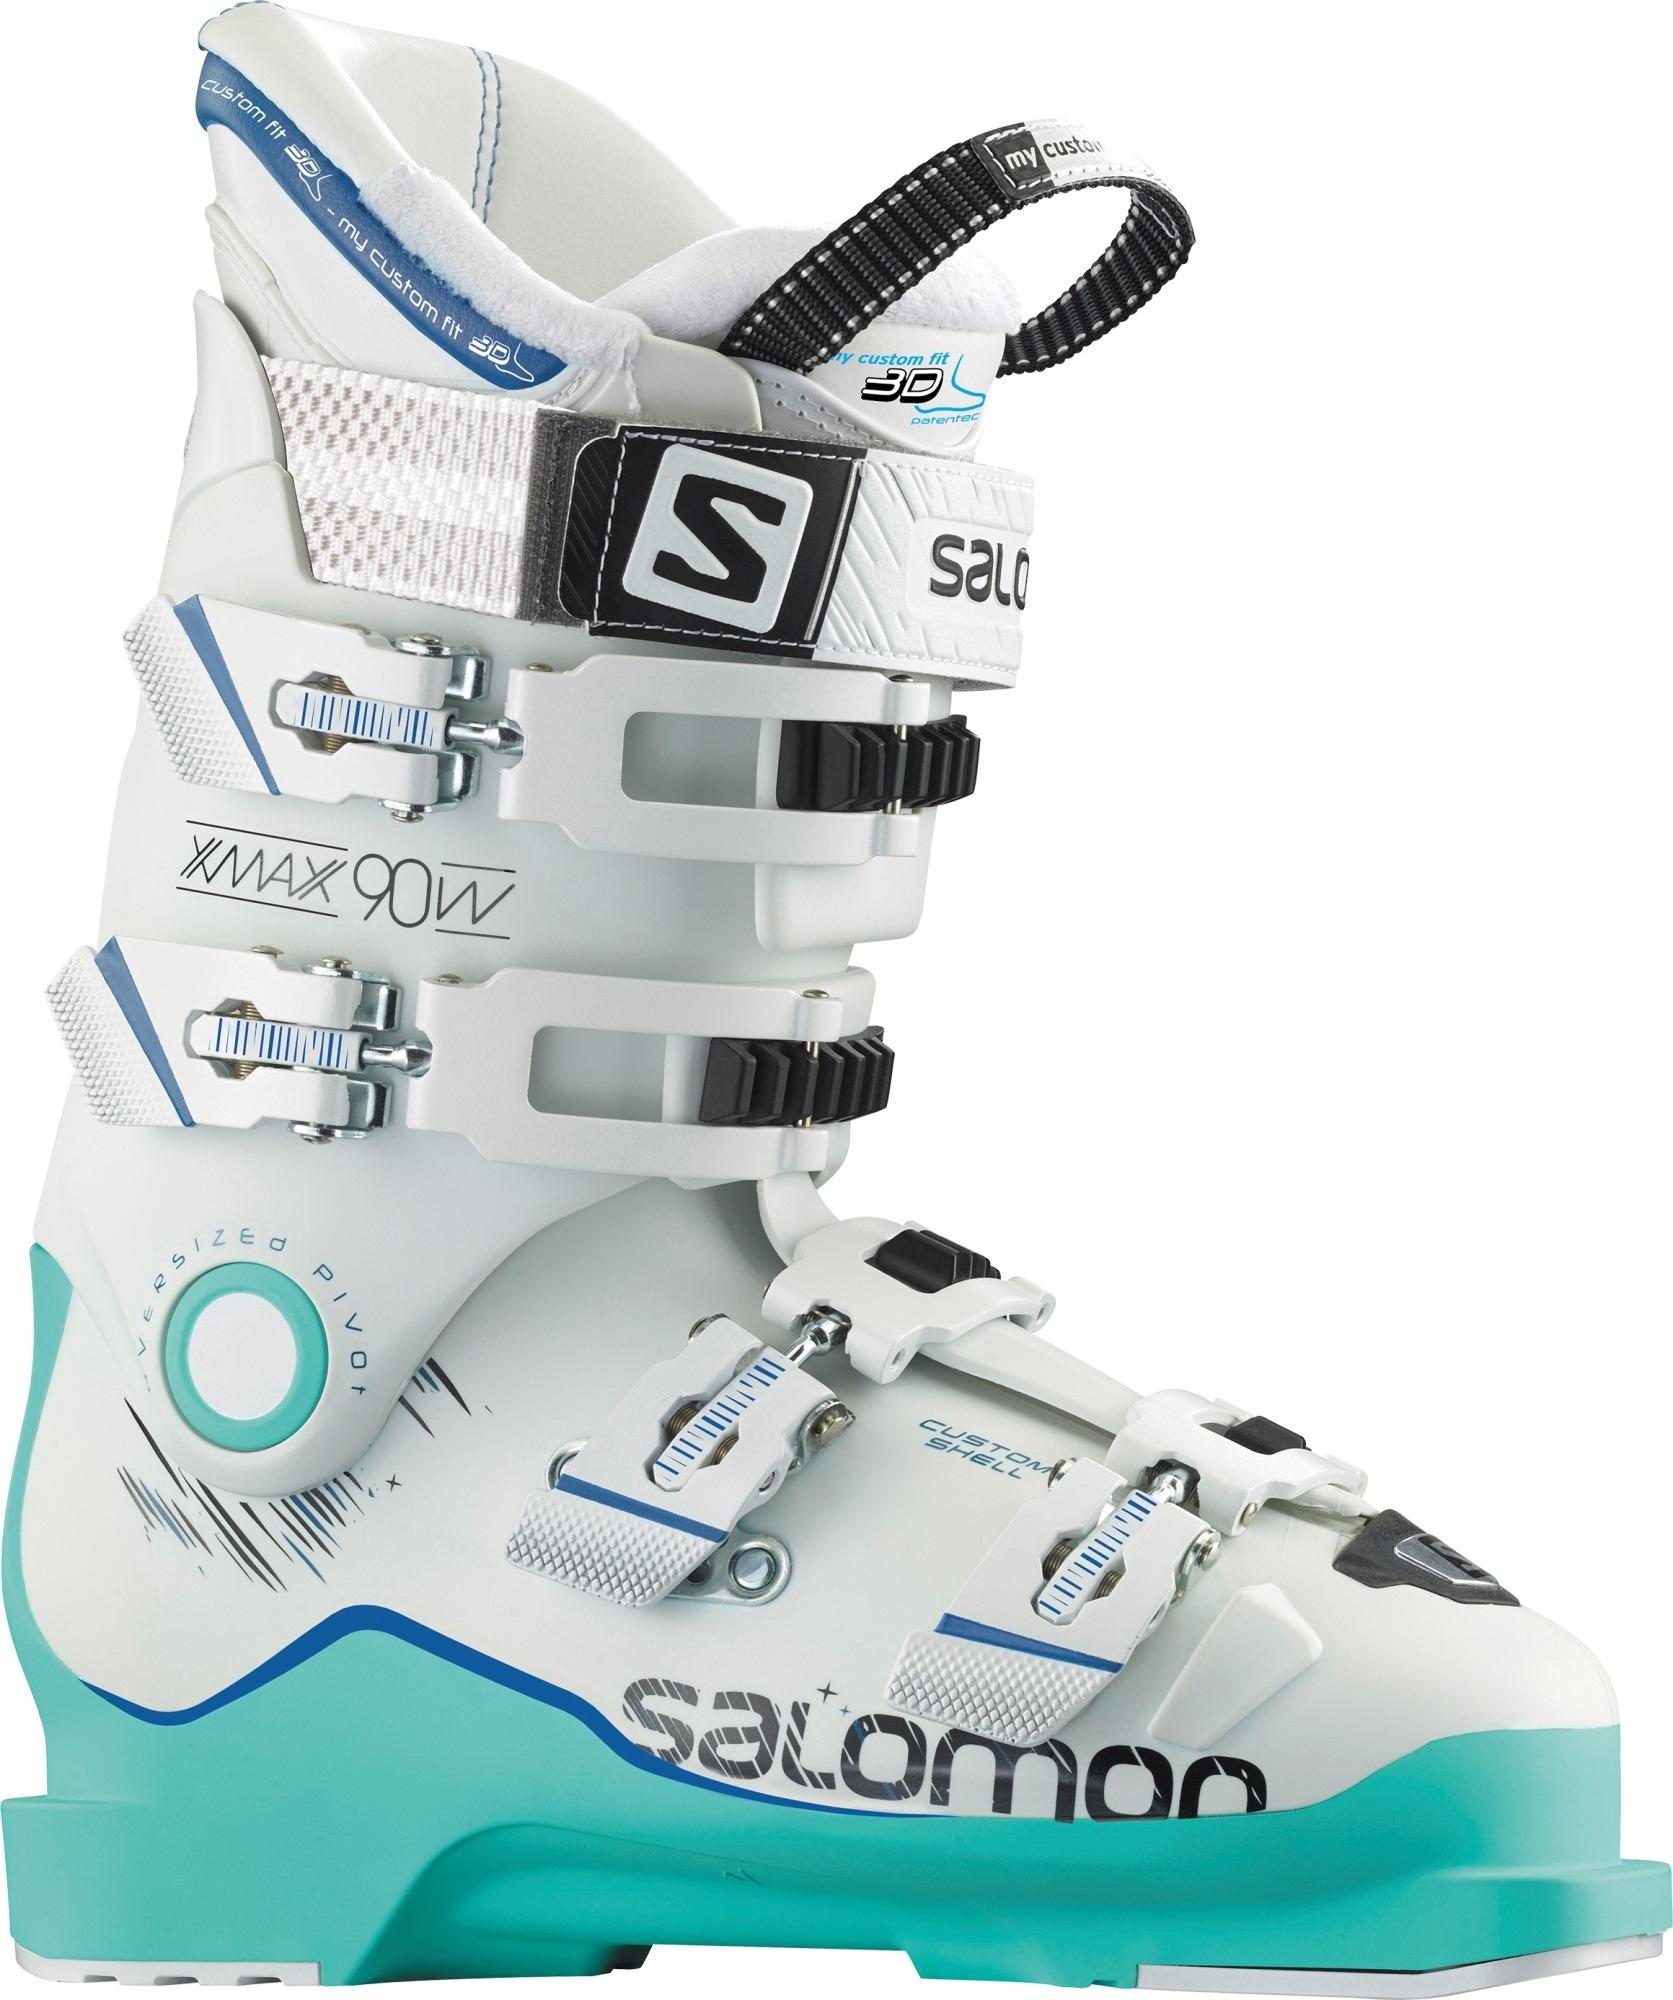 Salomon De Achat Femme 0RwRHW6BSq Chaussures Ski 4RjA53L